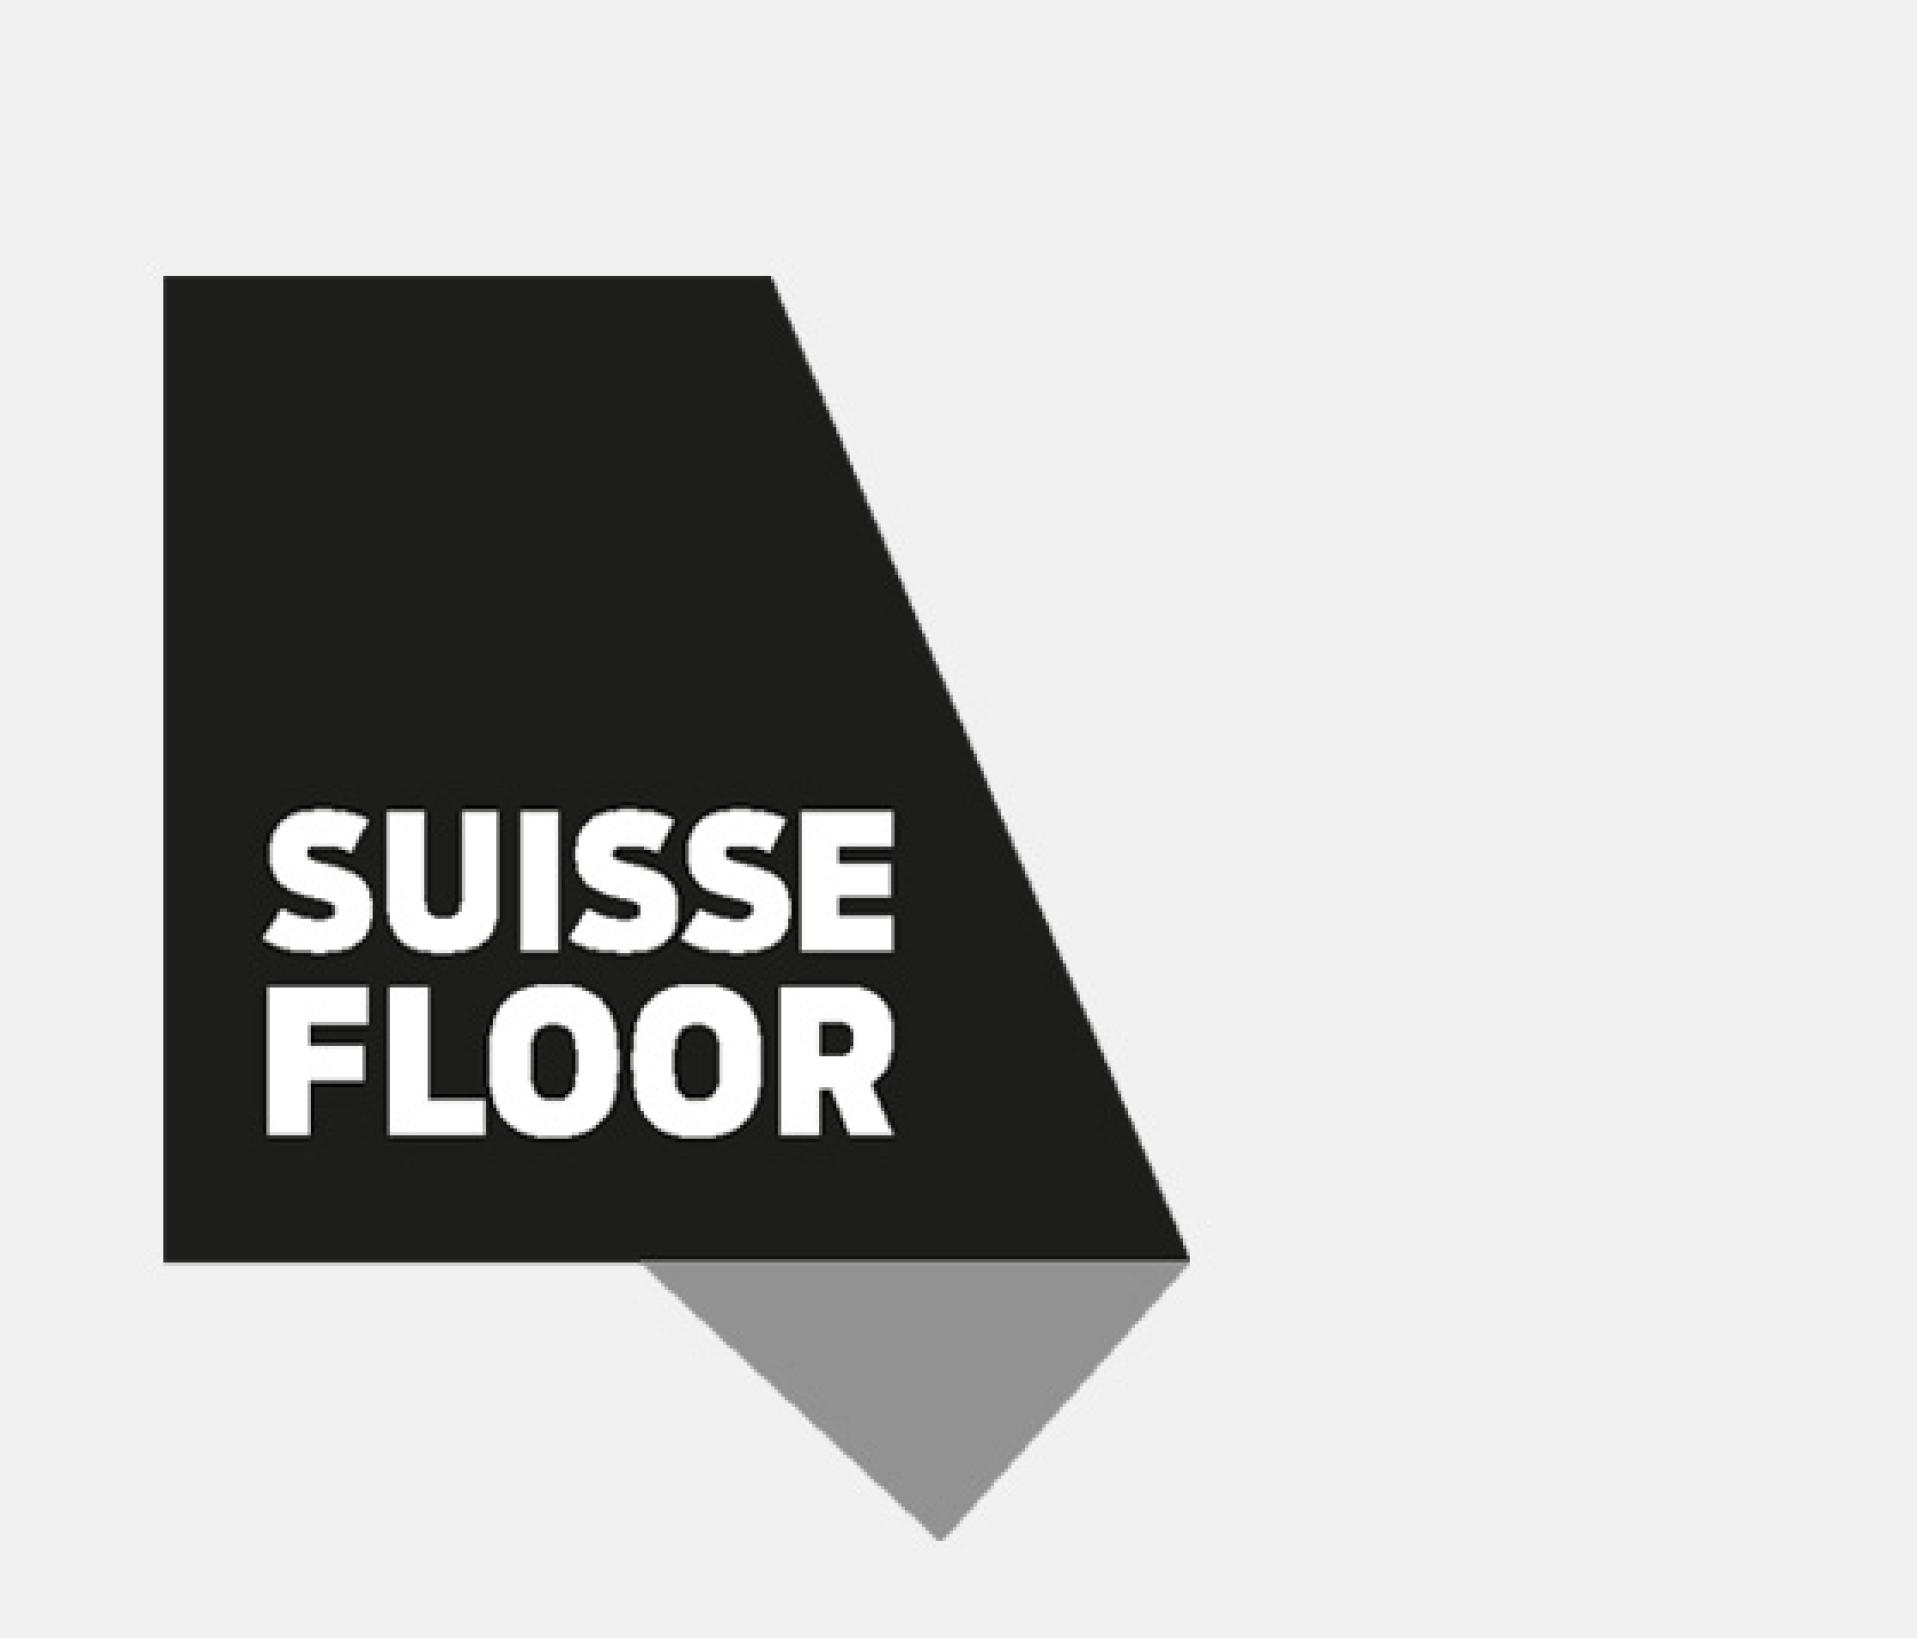 Suisse Floor 2019 – Communiqué de presse